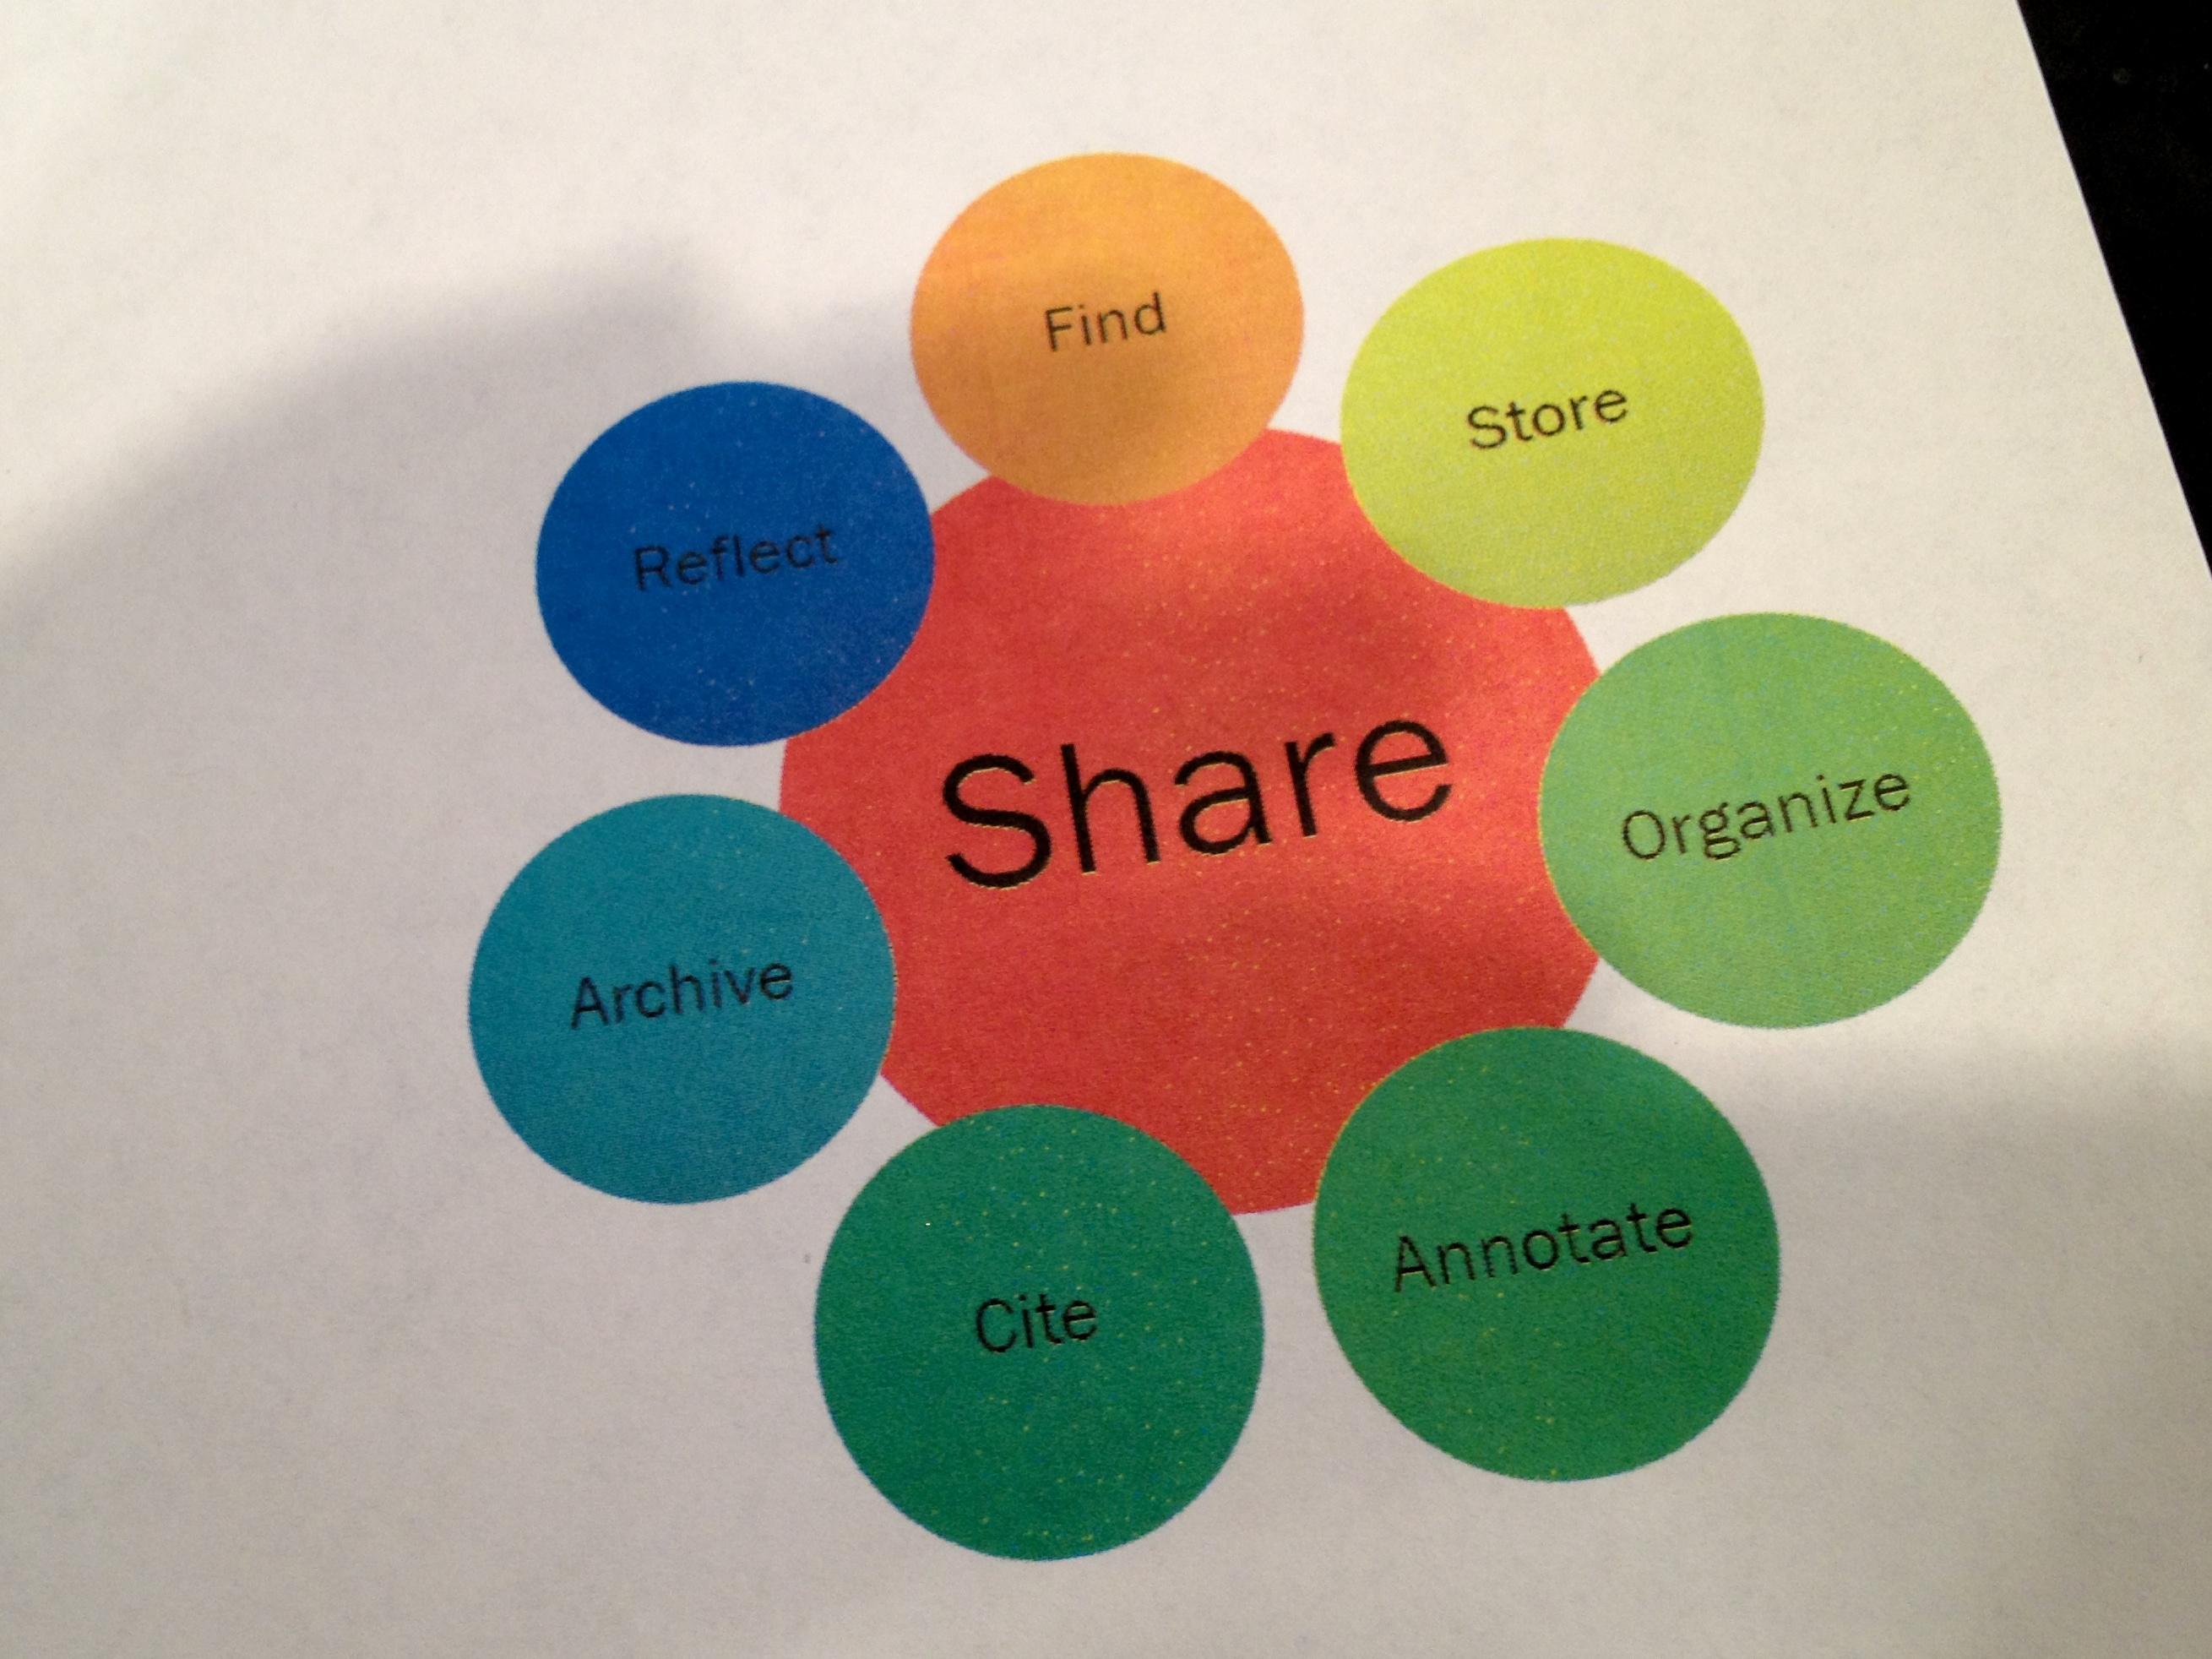 Gambar warna lingkaran merek produk ilustrasi desain diagram warna lingkaran merek produk ilustrasi desain diagram organ tltsym12 desain grafis ccuart Images